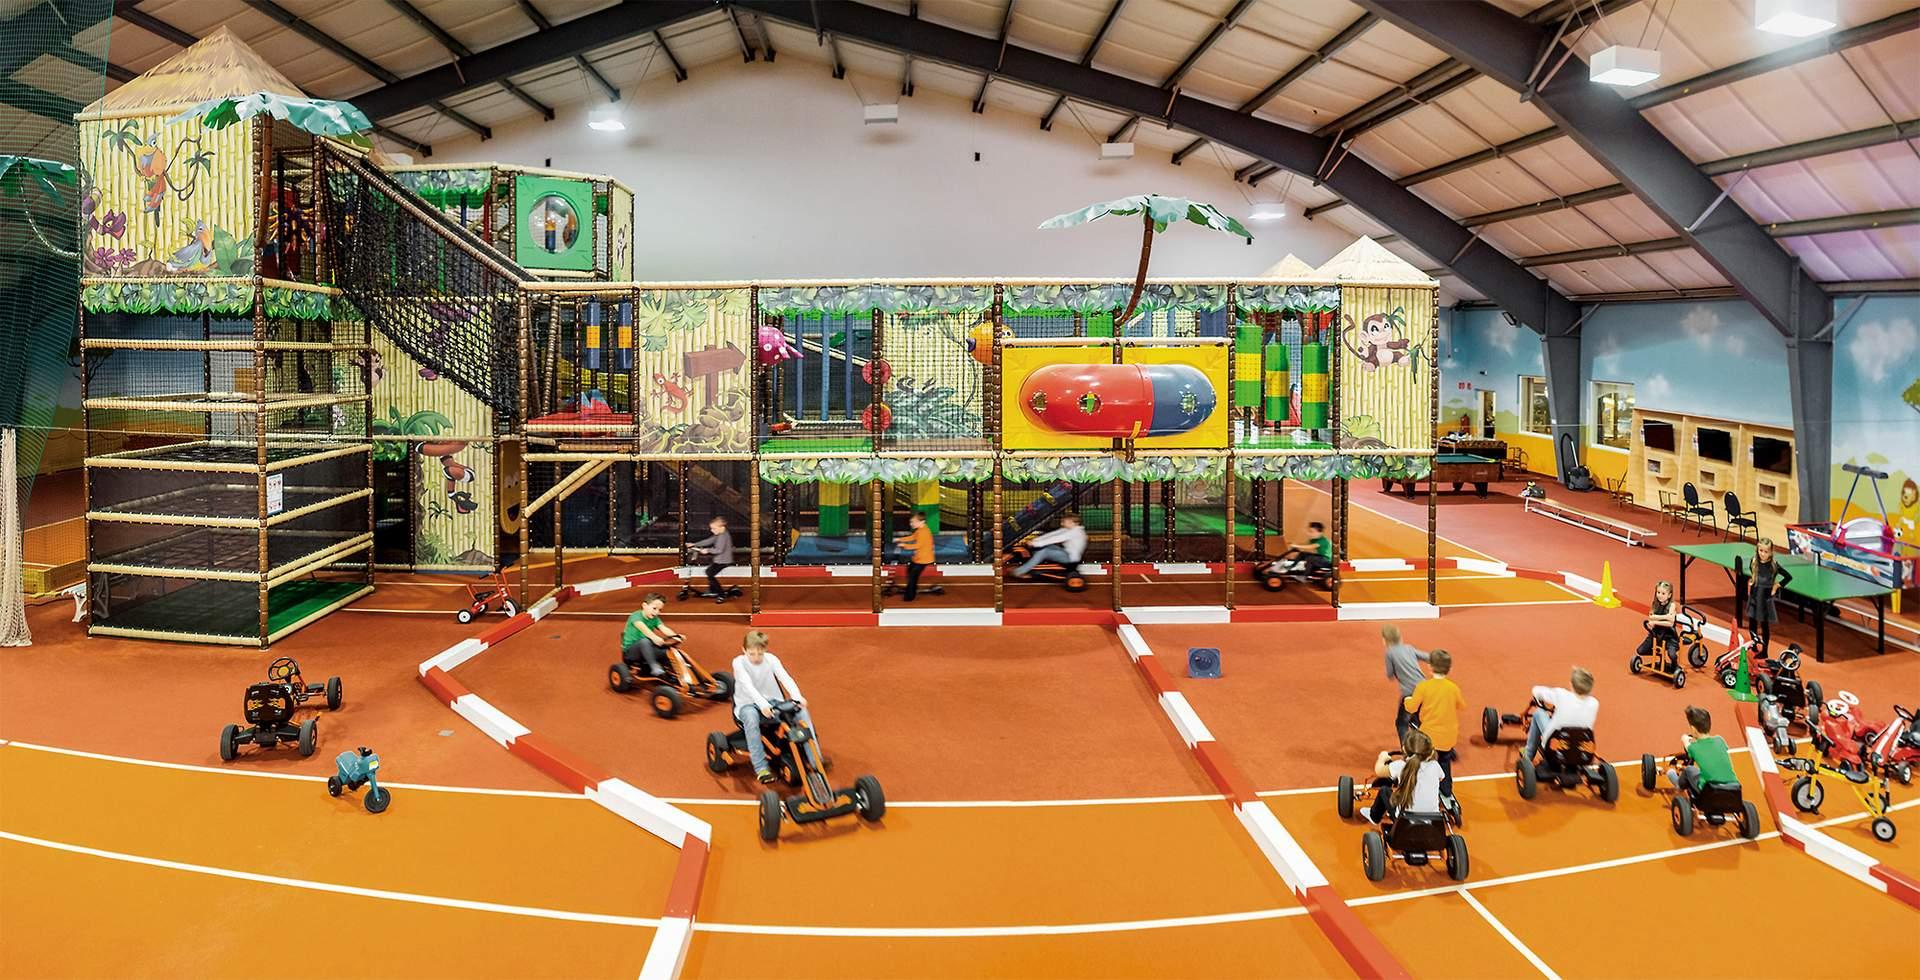 riesengroßer Indoor Funpark